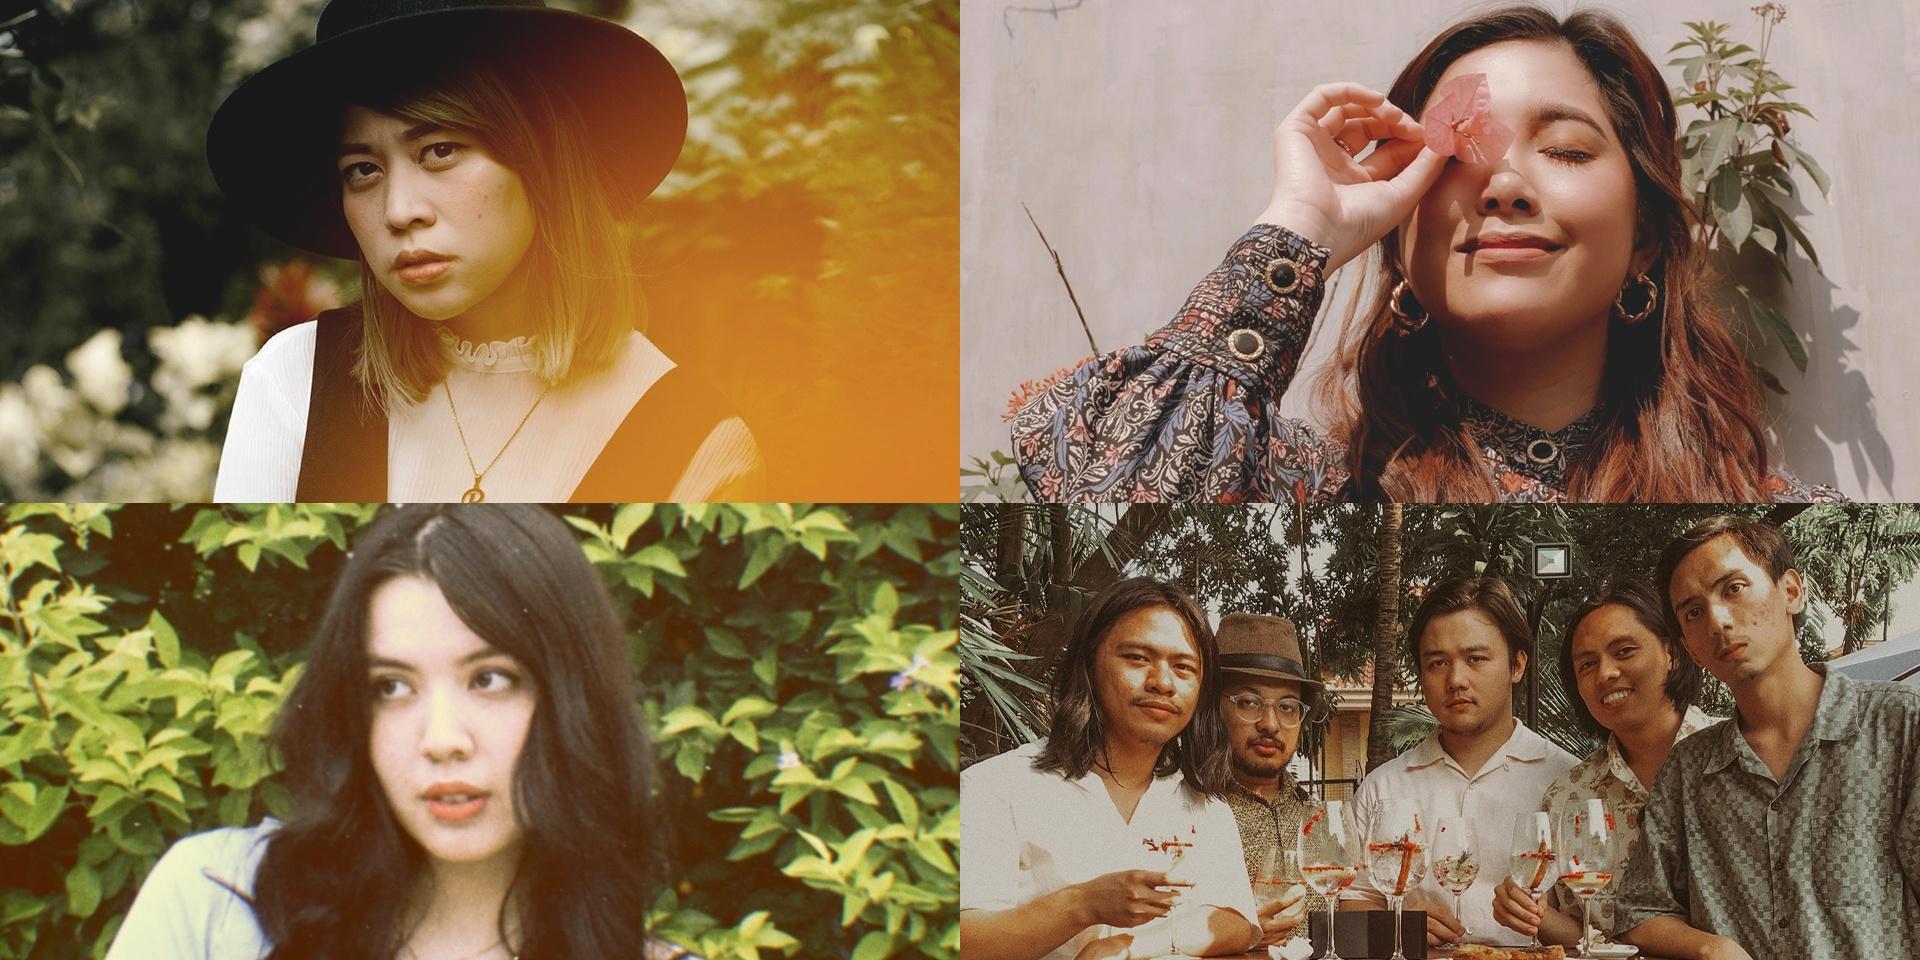 Moira Dela Torre, St. Wolf, Reese Lansangan, Eliza Marie, Flu, and more release new music – listen